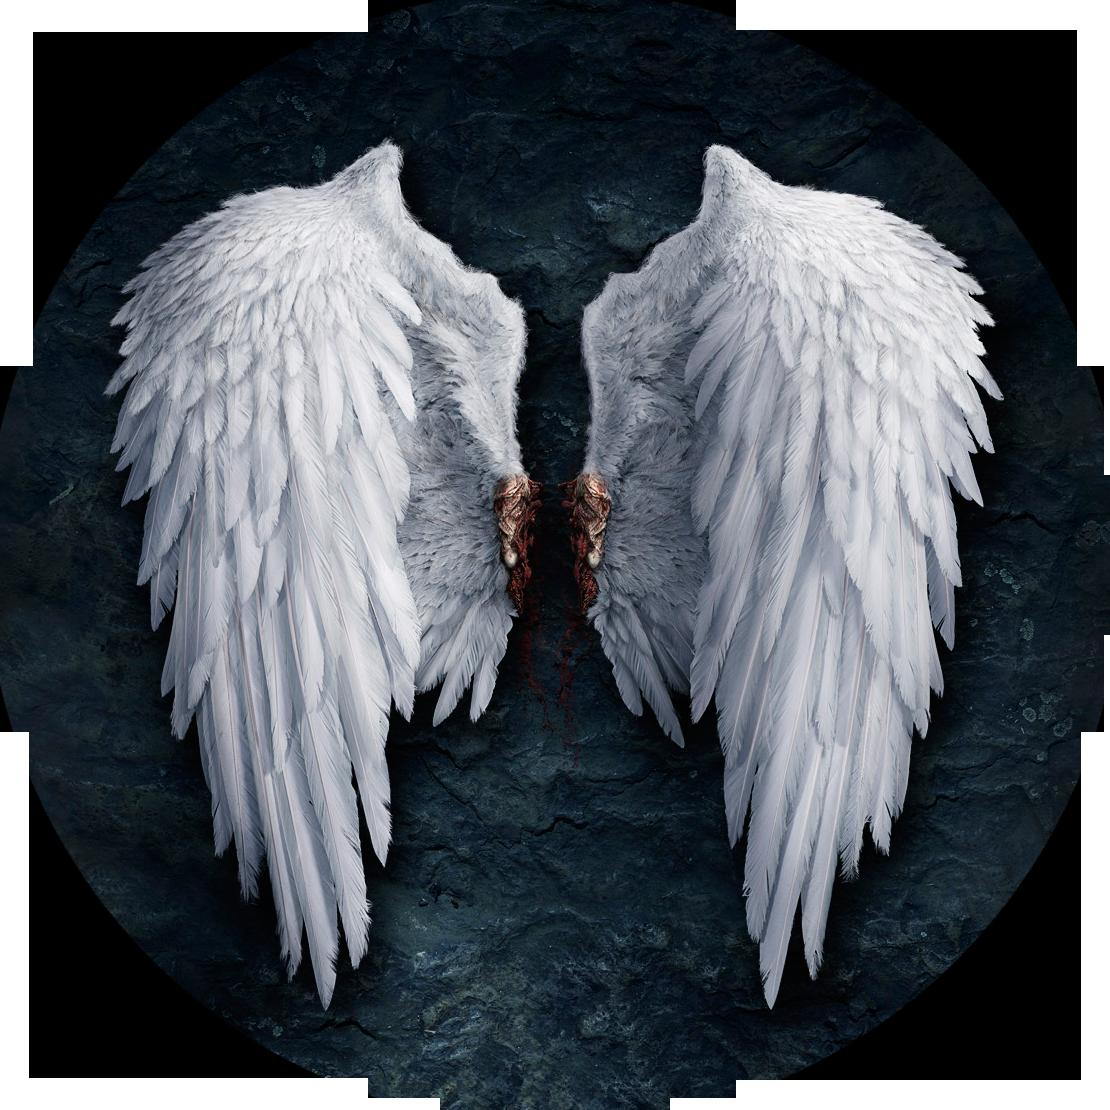 Wings | Aion Wiki | FANDOM powered by Wikia